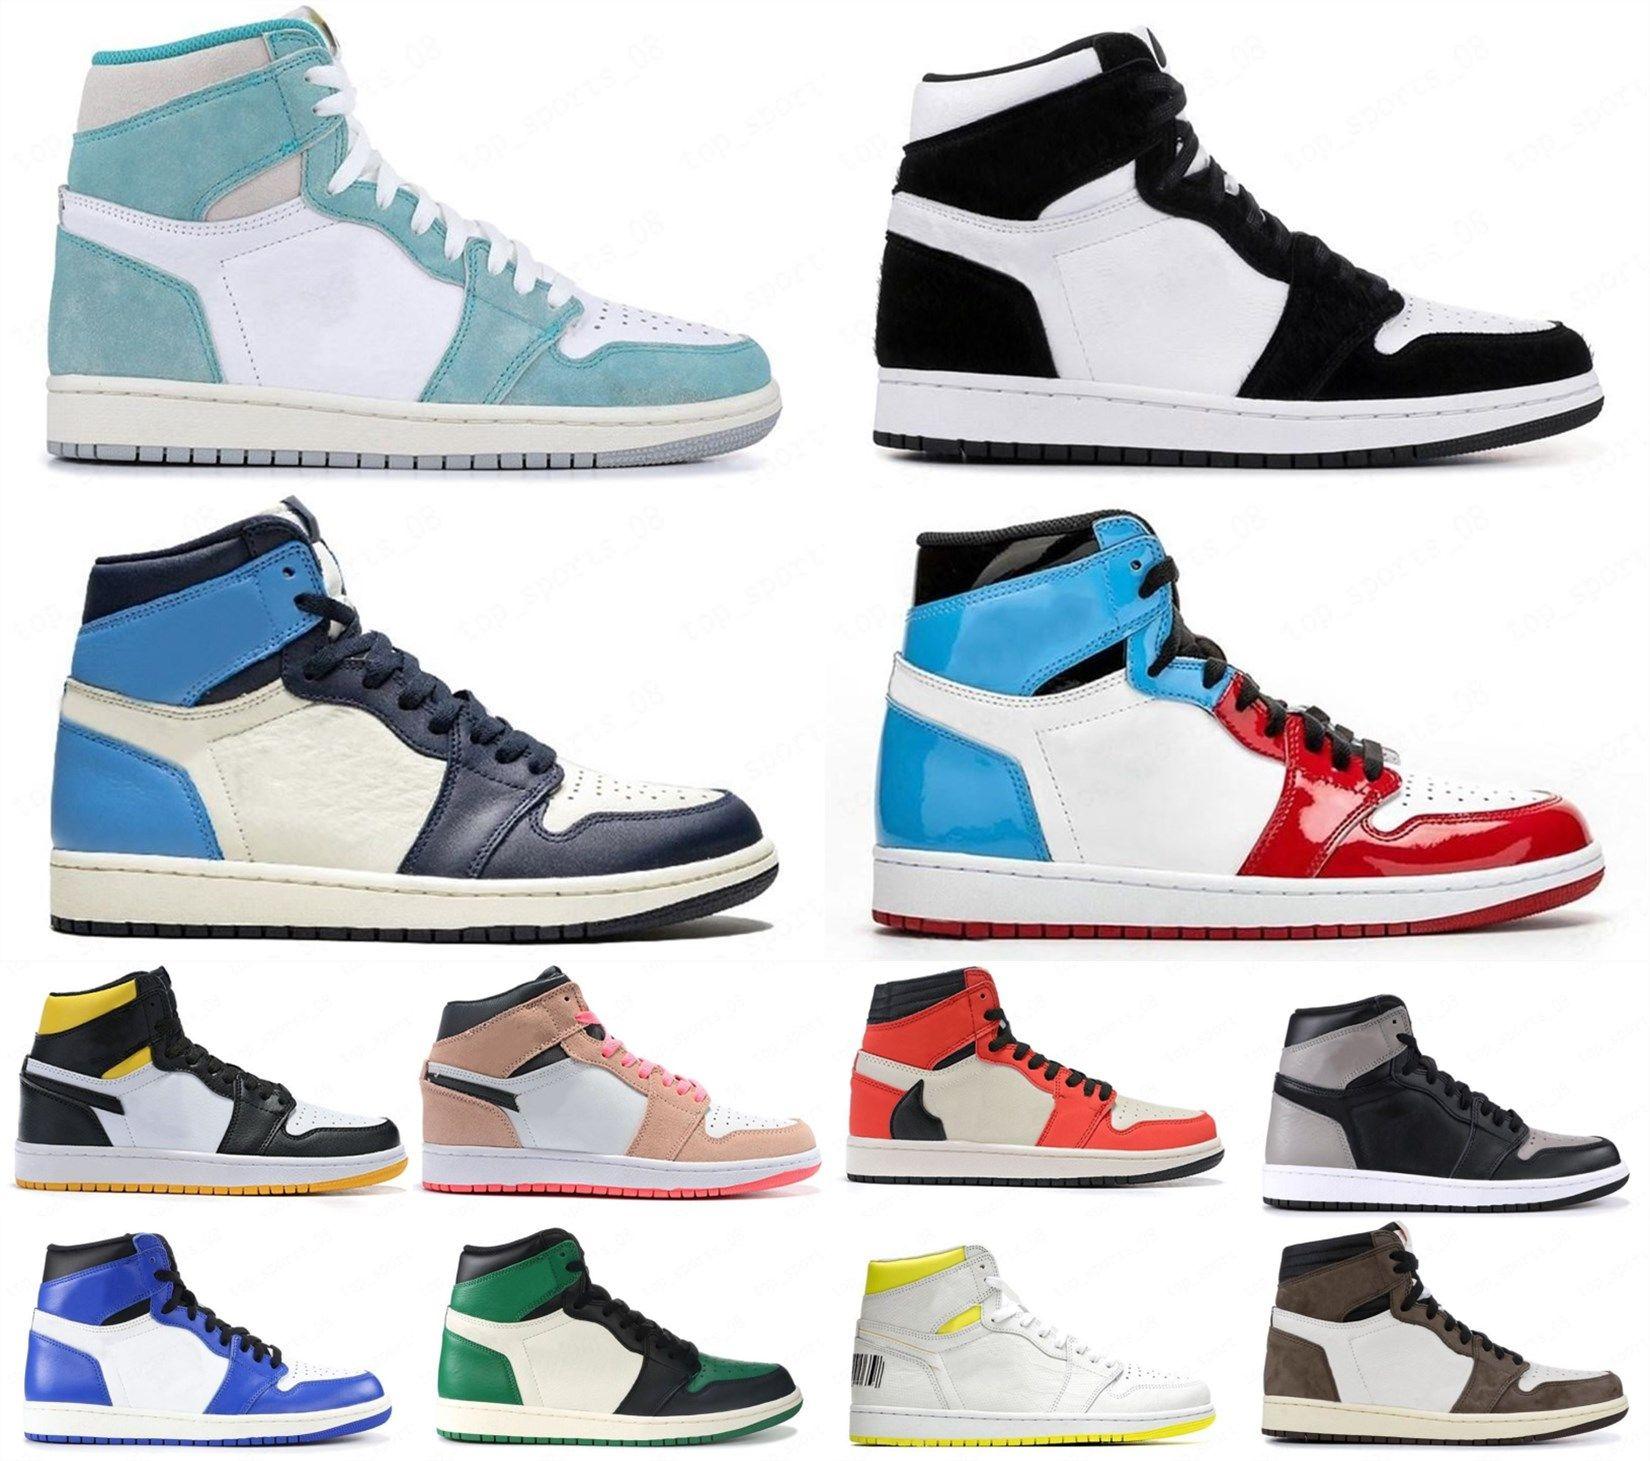 1 1s High Royal Toe Court Roxo Jogo Royal Pine Black Men Sapatos de basquete 1s High 85 Varsity Red Sneaker